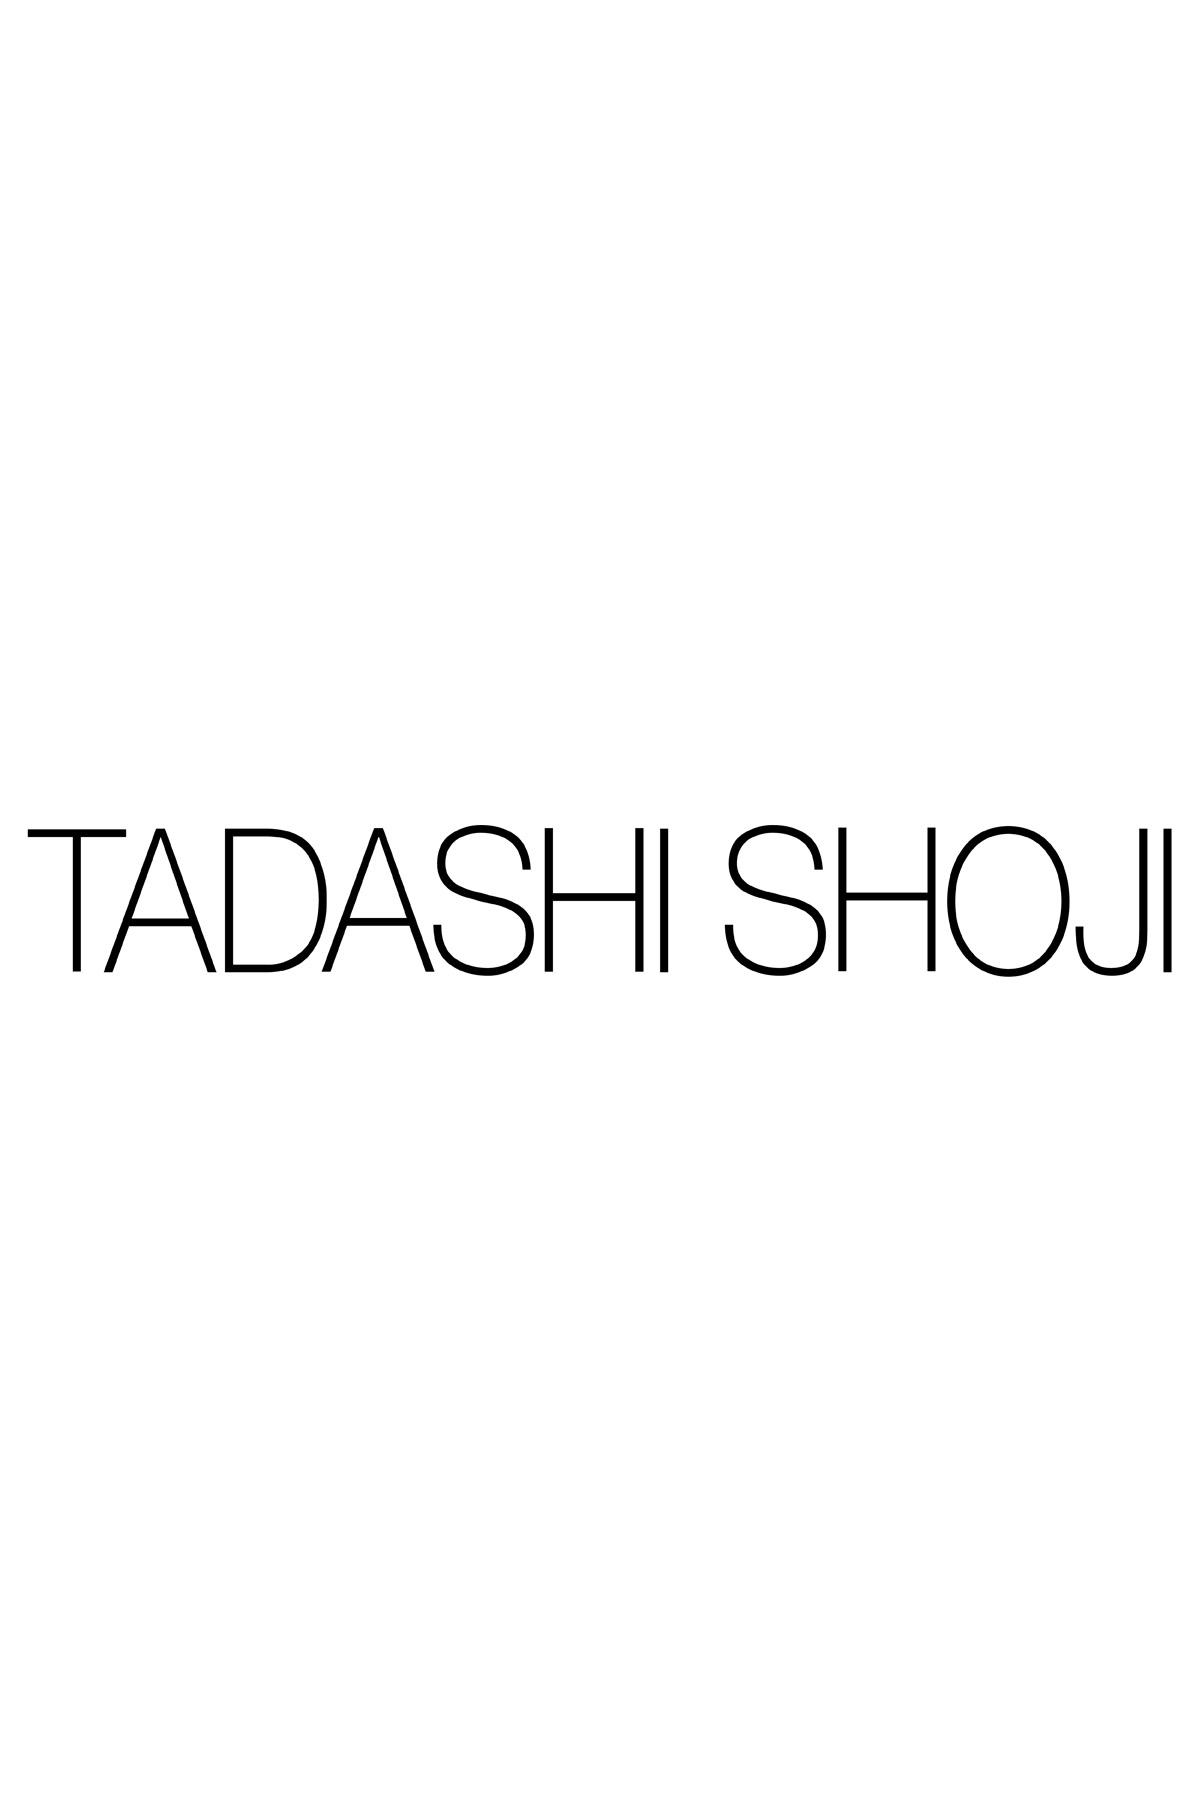 Corded Embroidery on Tulle Cap Sleeve Dress - PETITE - Tadashi Shoji